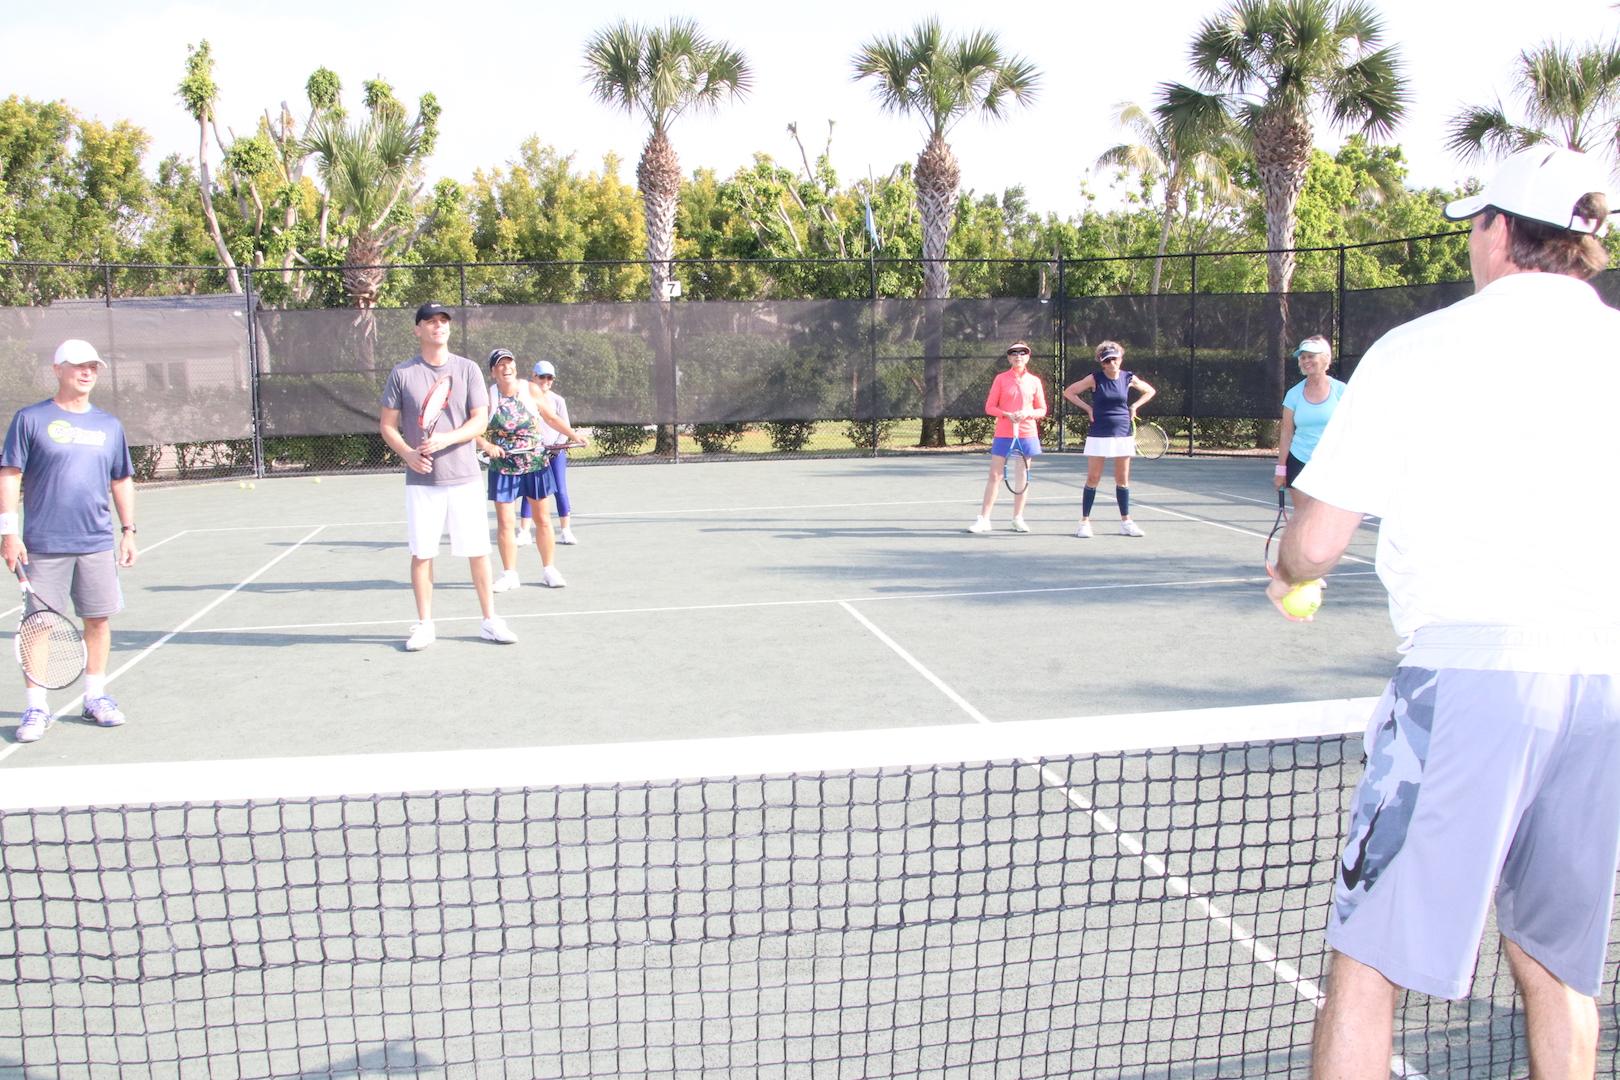 tennis-Donteaching2.JPG